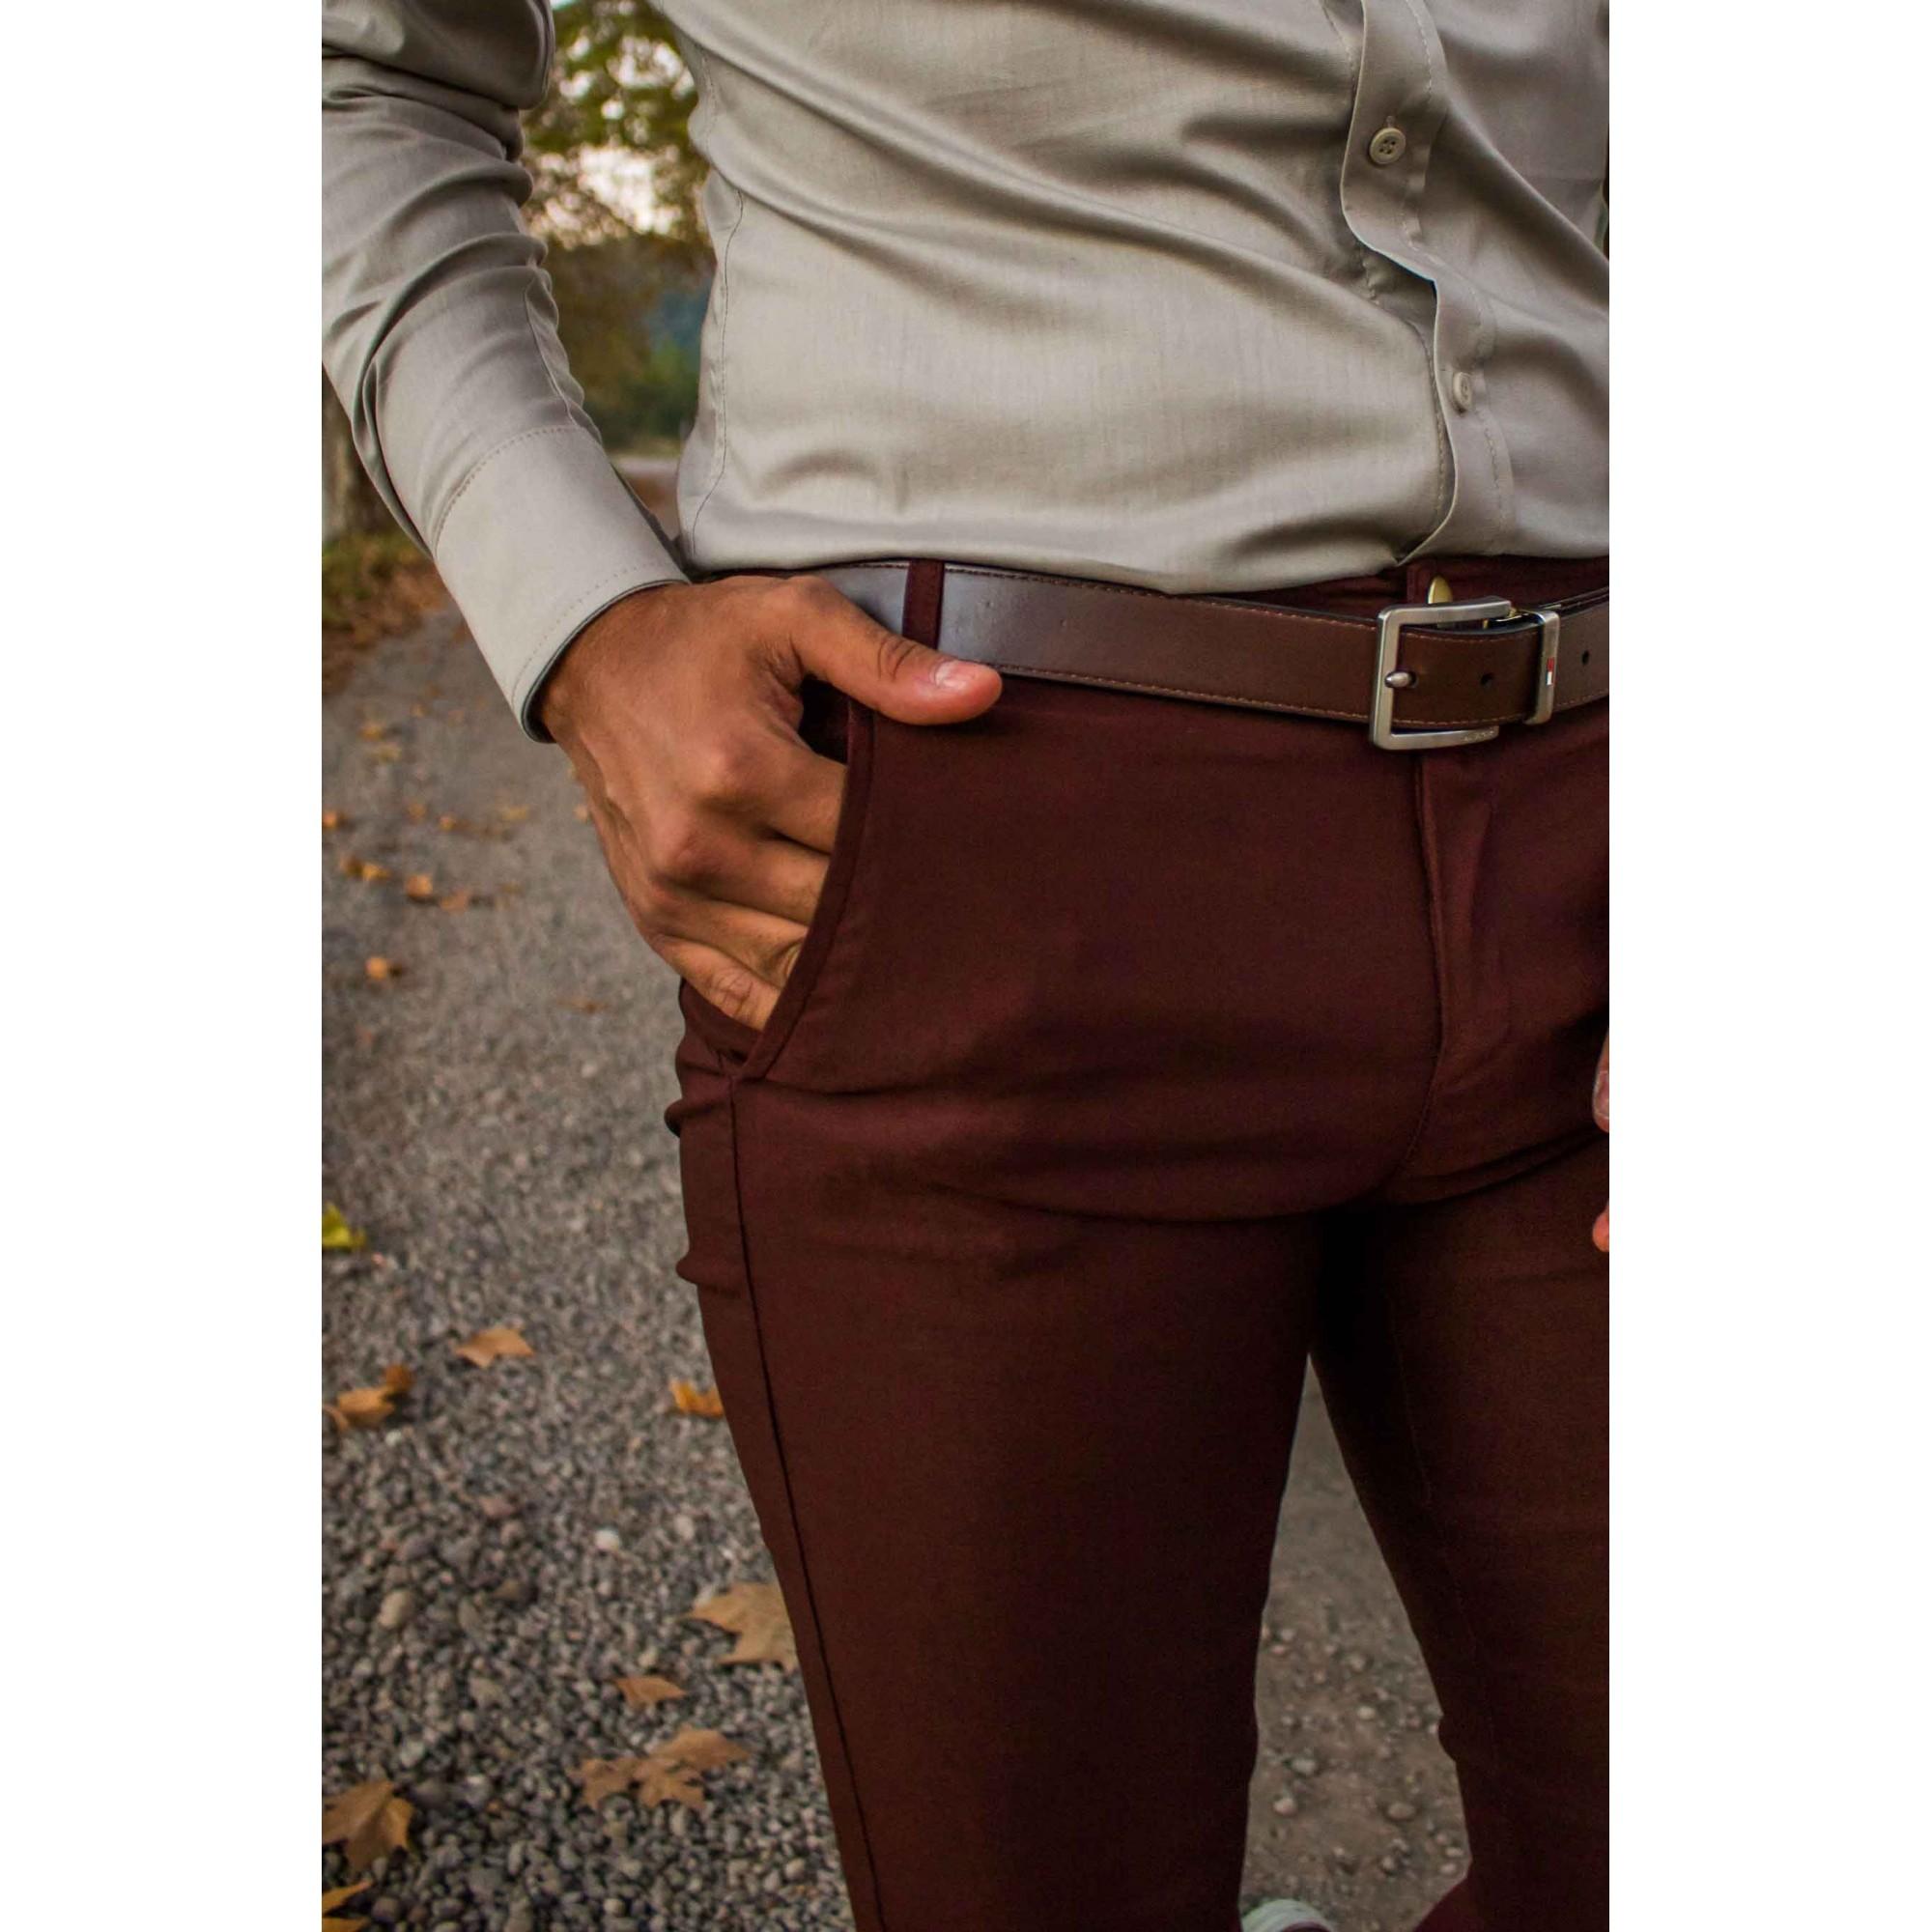 Camisa Masculina Slim Manga Longa com Elastano Cinza